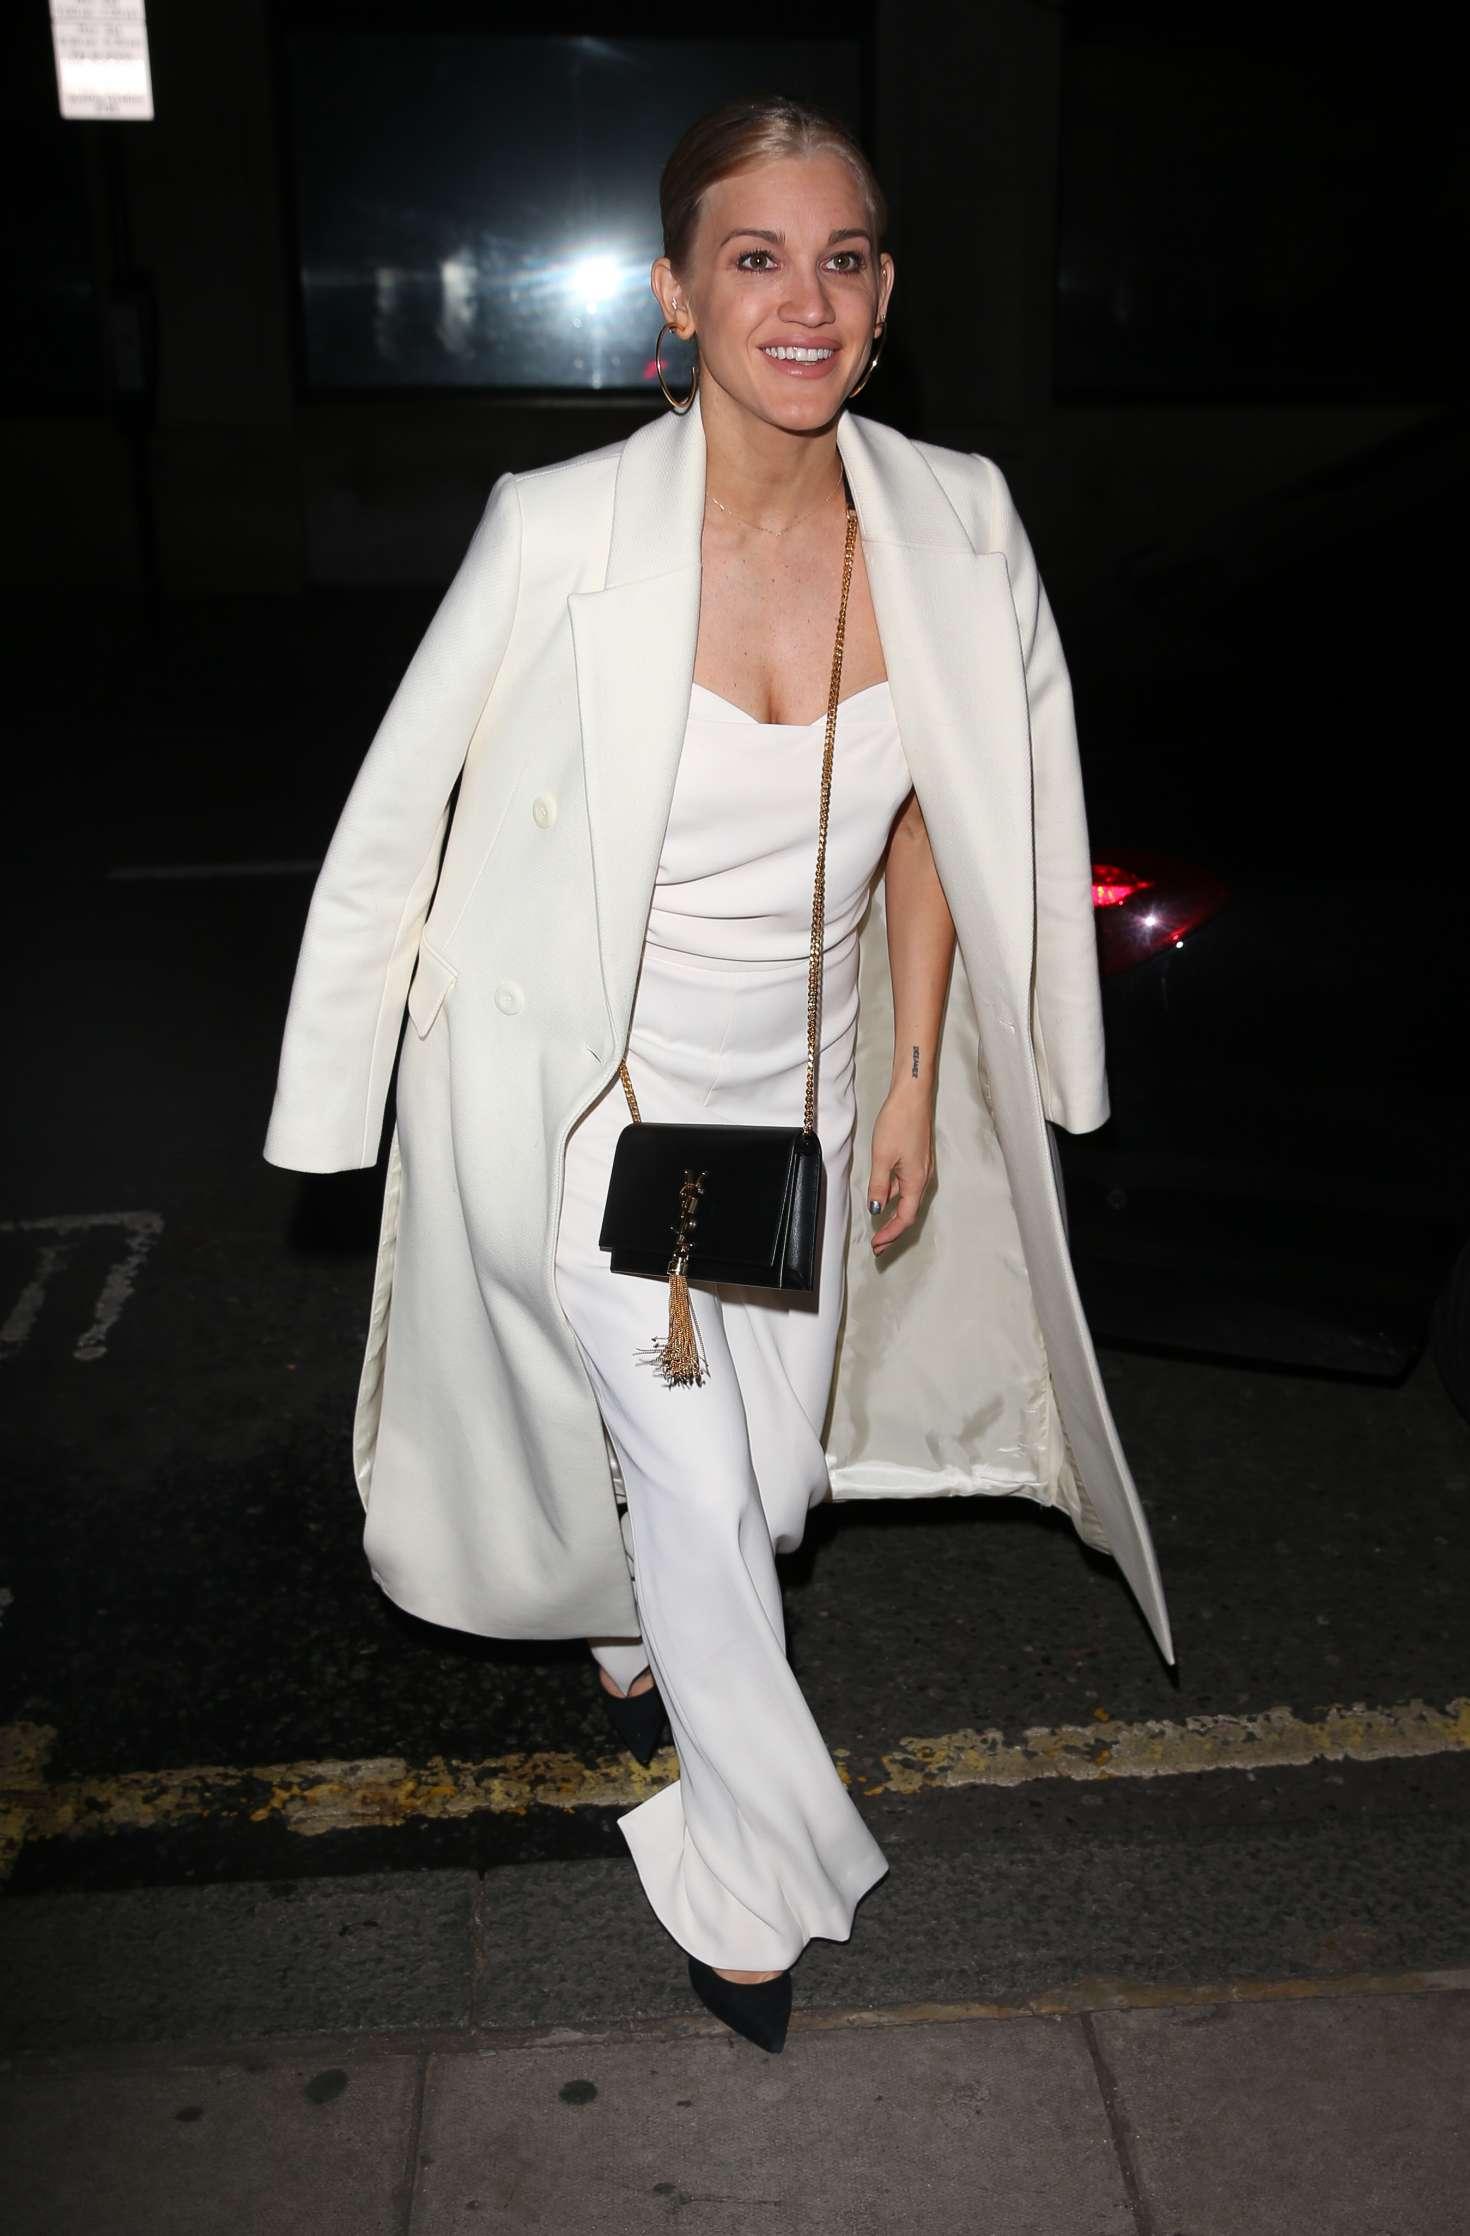 Ashley Roberts 2018 : Ashley Roberts: Arriving on Chris Evans Breakfast Show -07